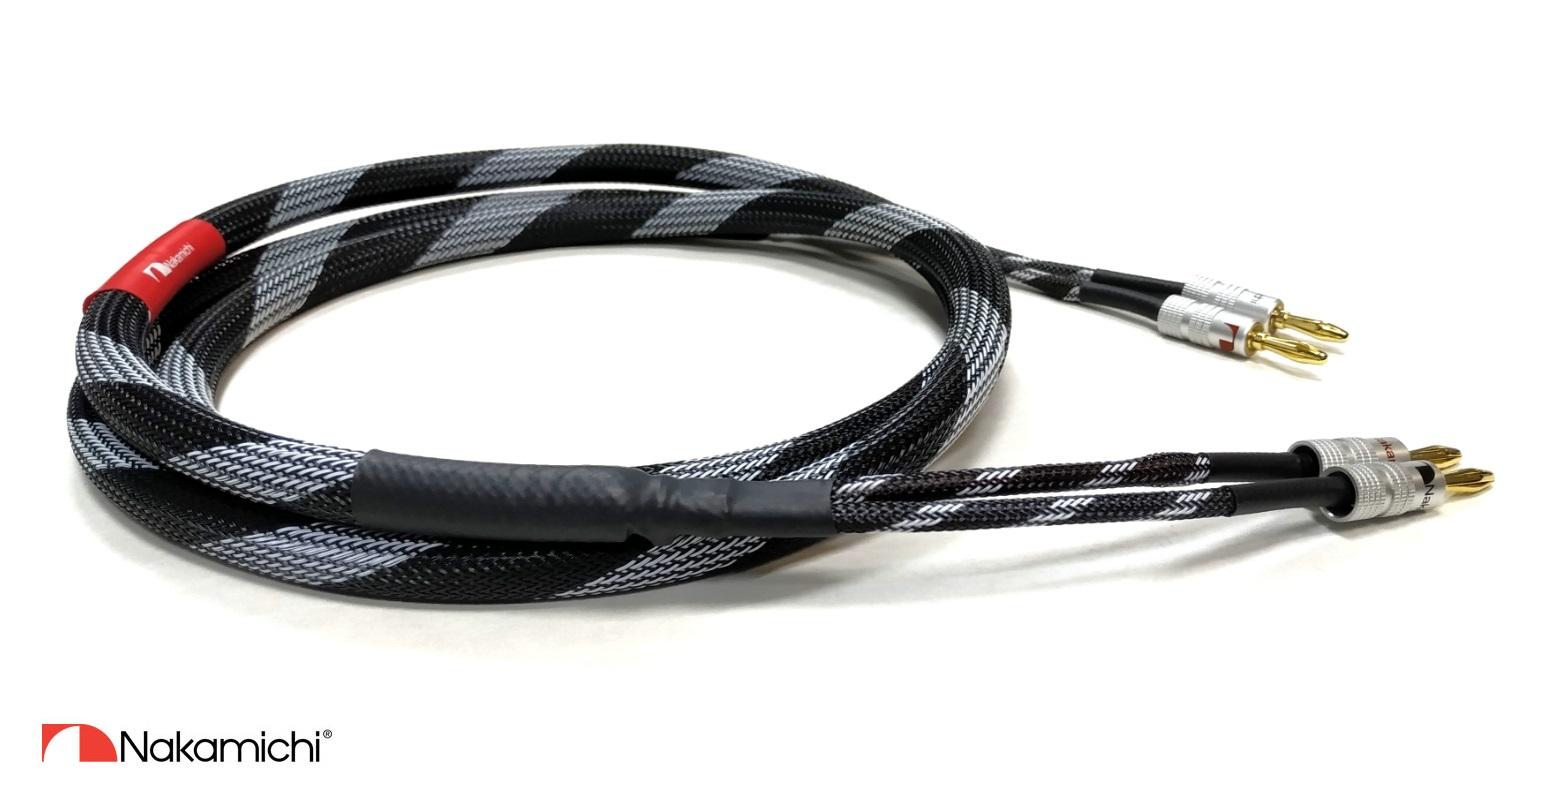 Nakamichi - Speaker Cable 6N30